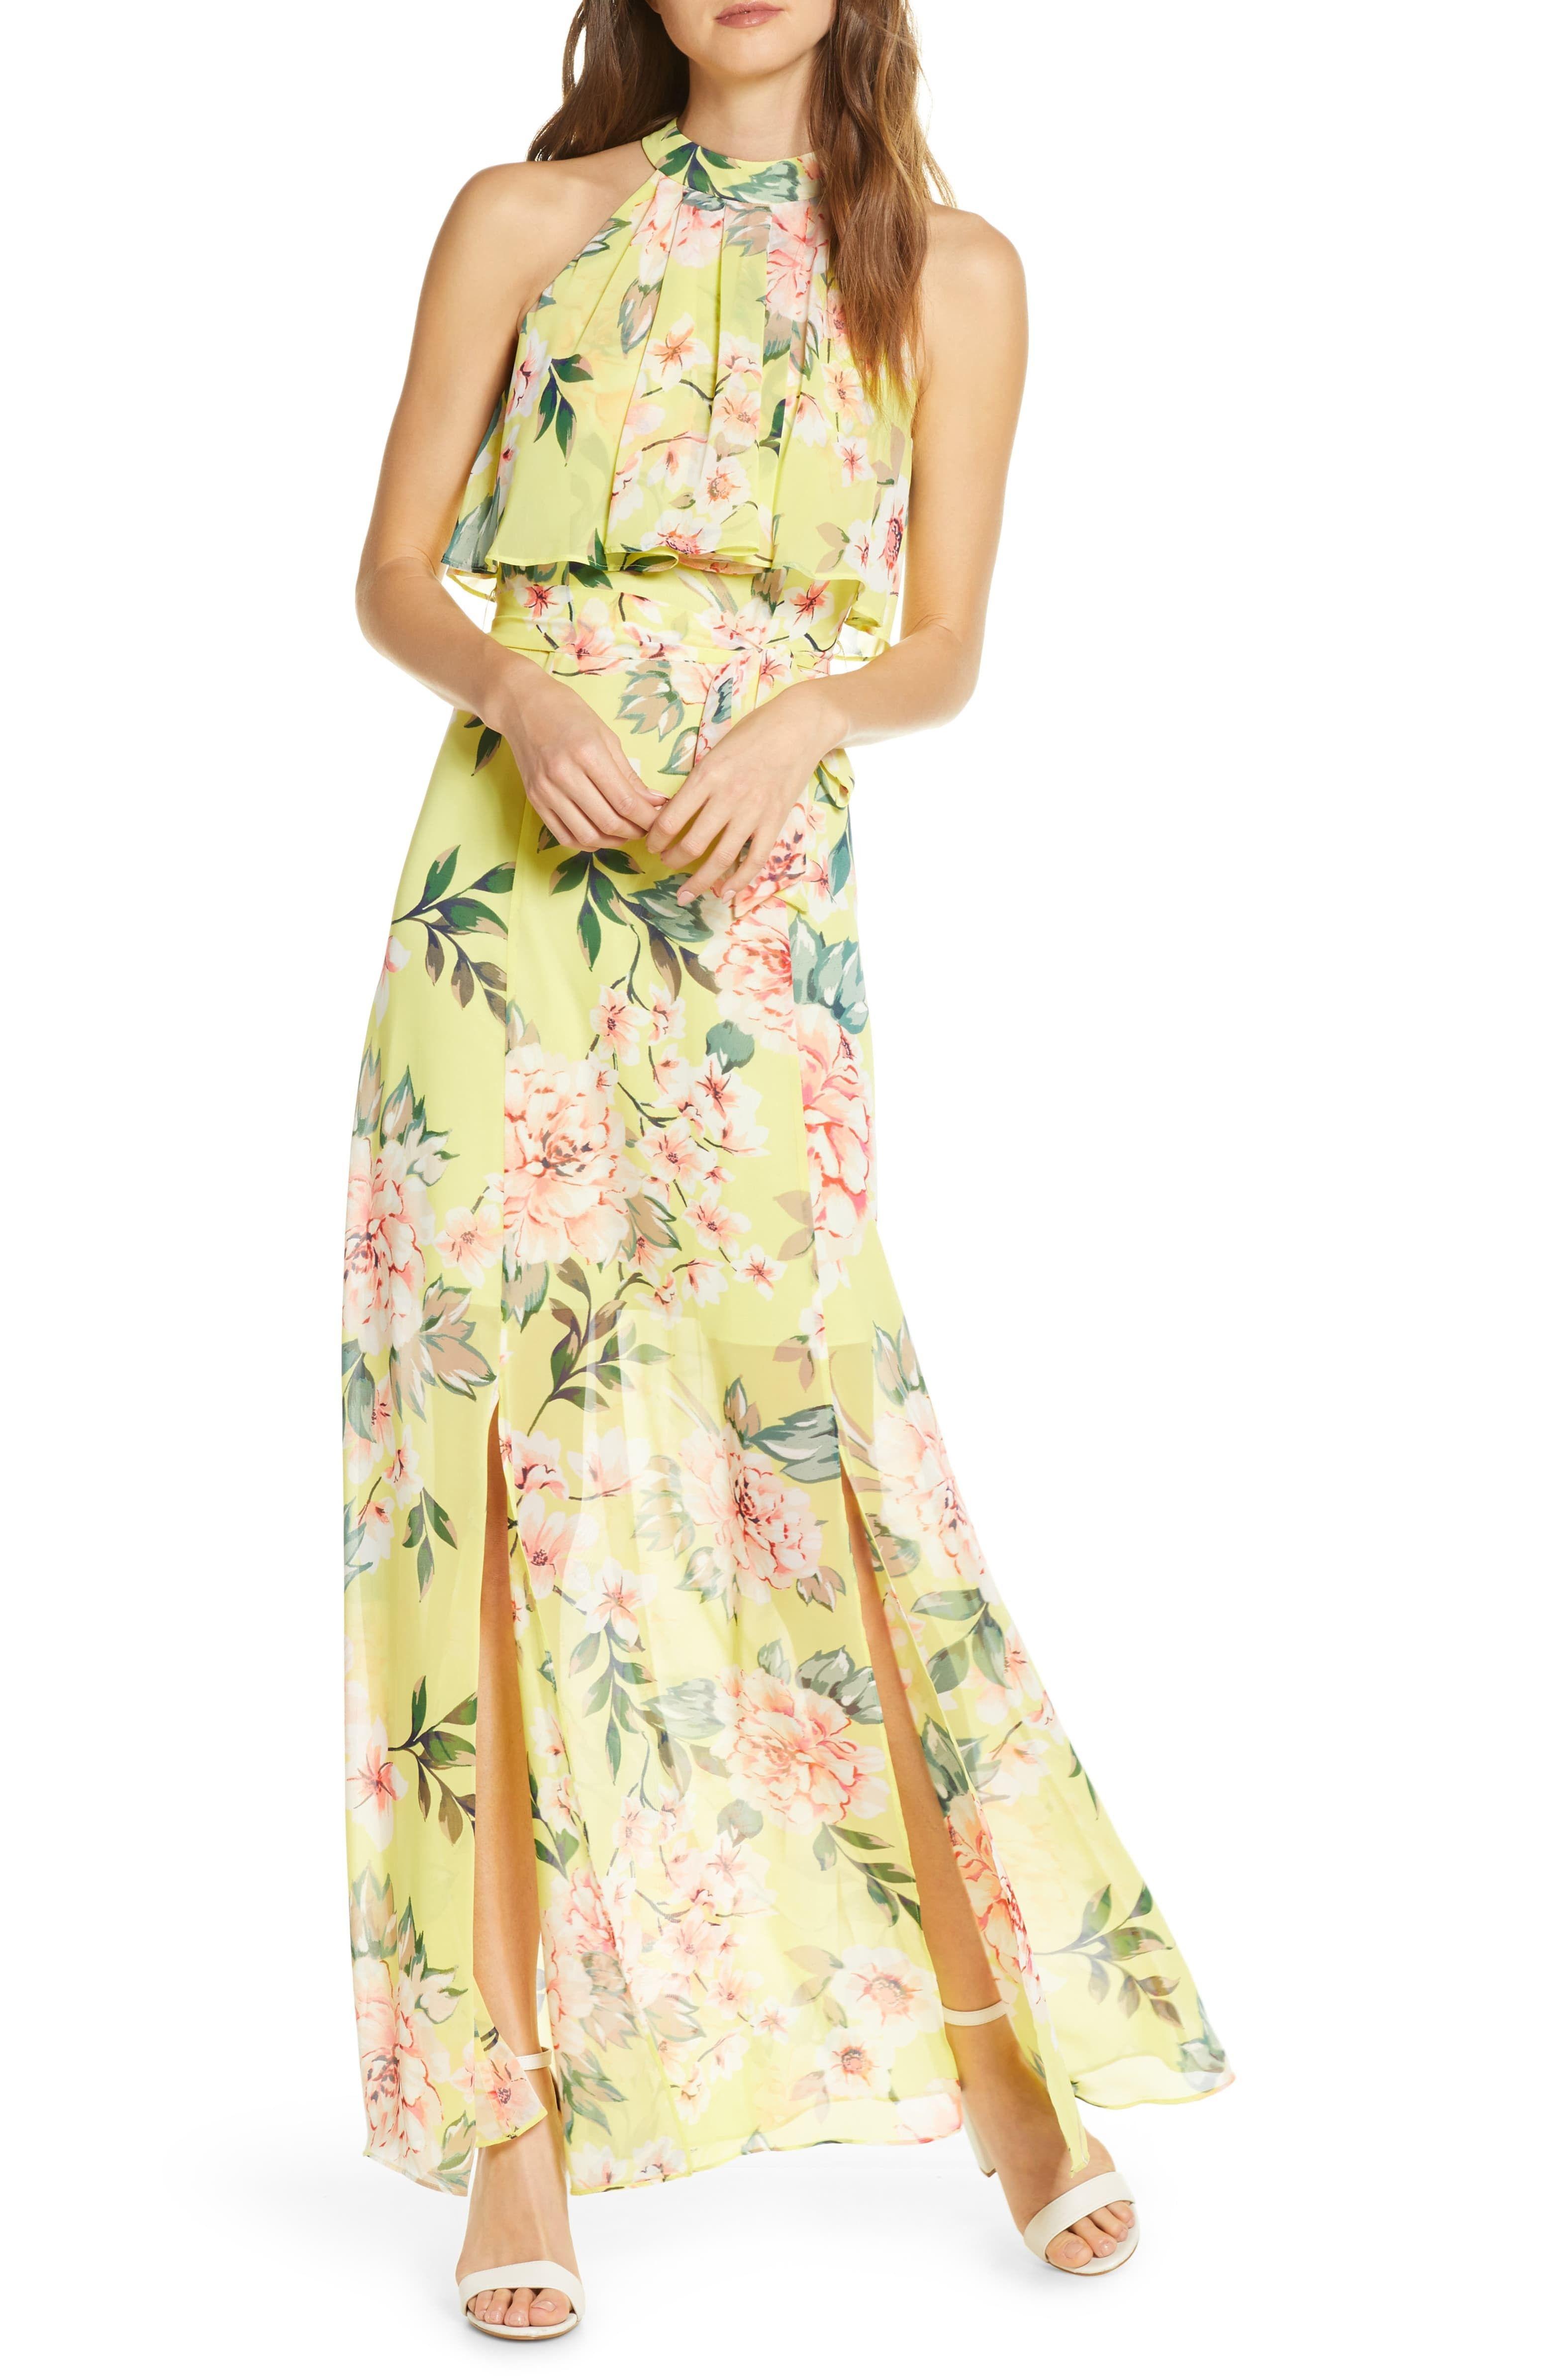 Yellow Floral Chiffon Maxi Dress Springoutfit Springdresses Weddingguest Dresses Springstyle Affiliatel In 2020 Chiffon Maxi Dress Maxi Dress Maxi Dress Online